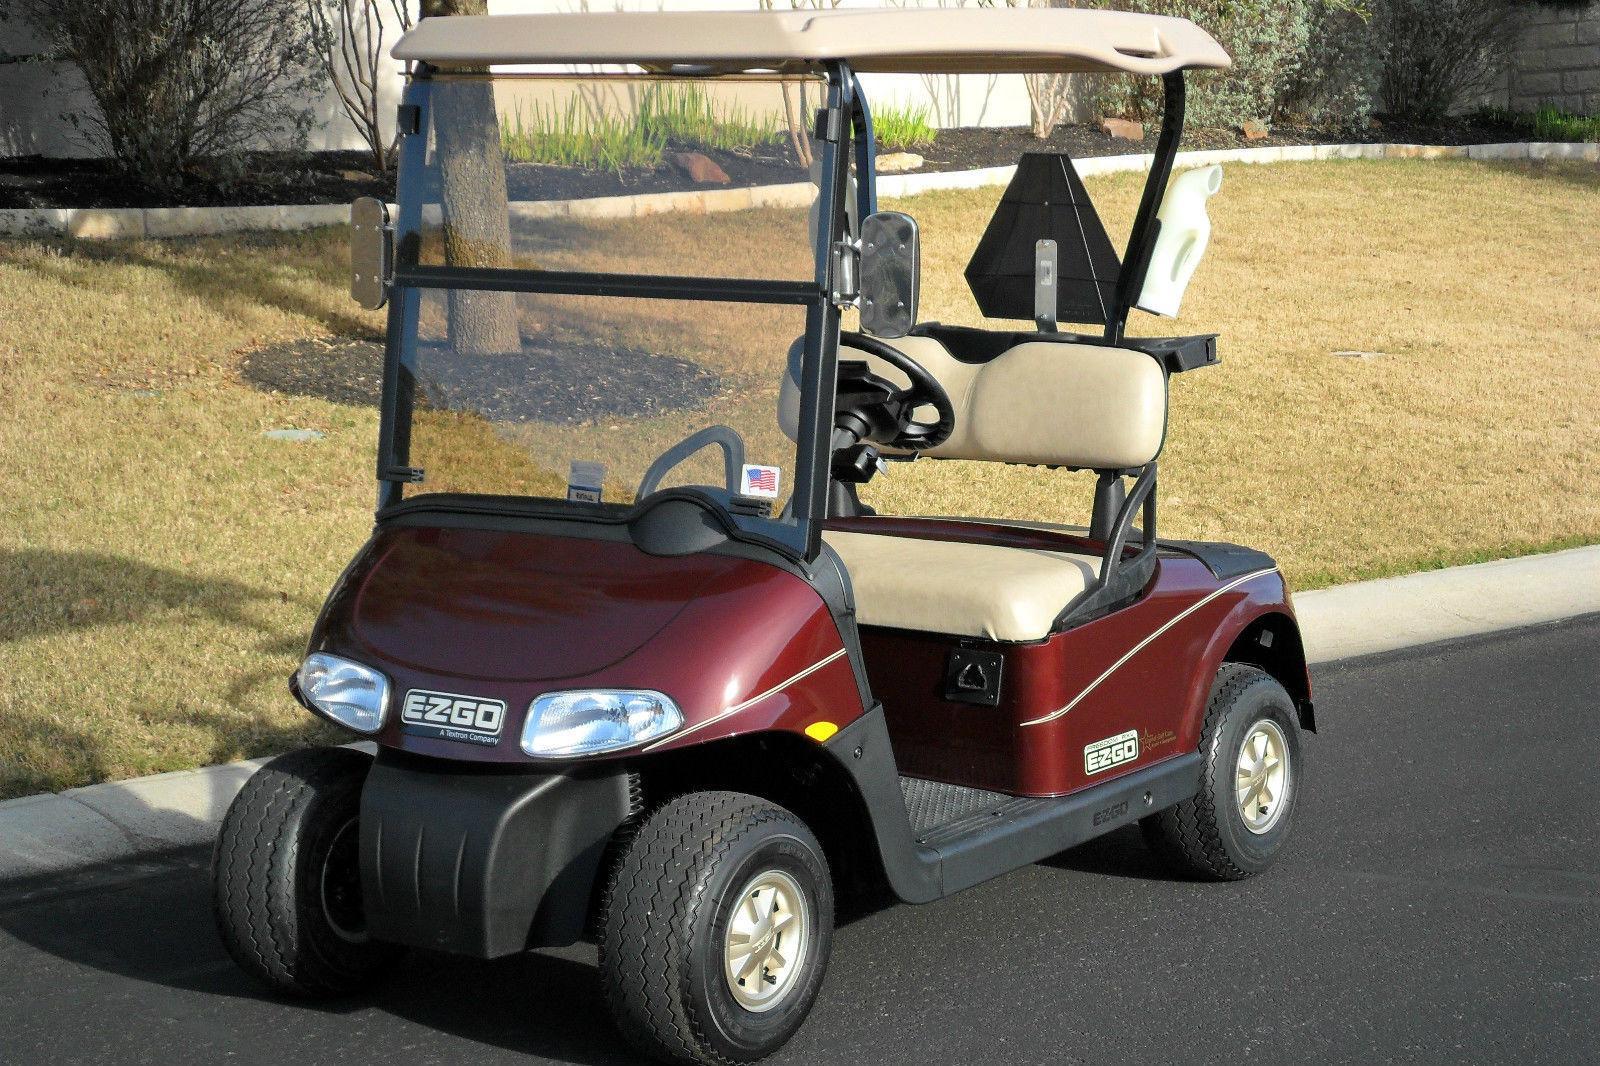 ez go rxv electric wiring diagram motor manufacturer volkswagen e golf ezgo cart get free